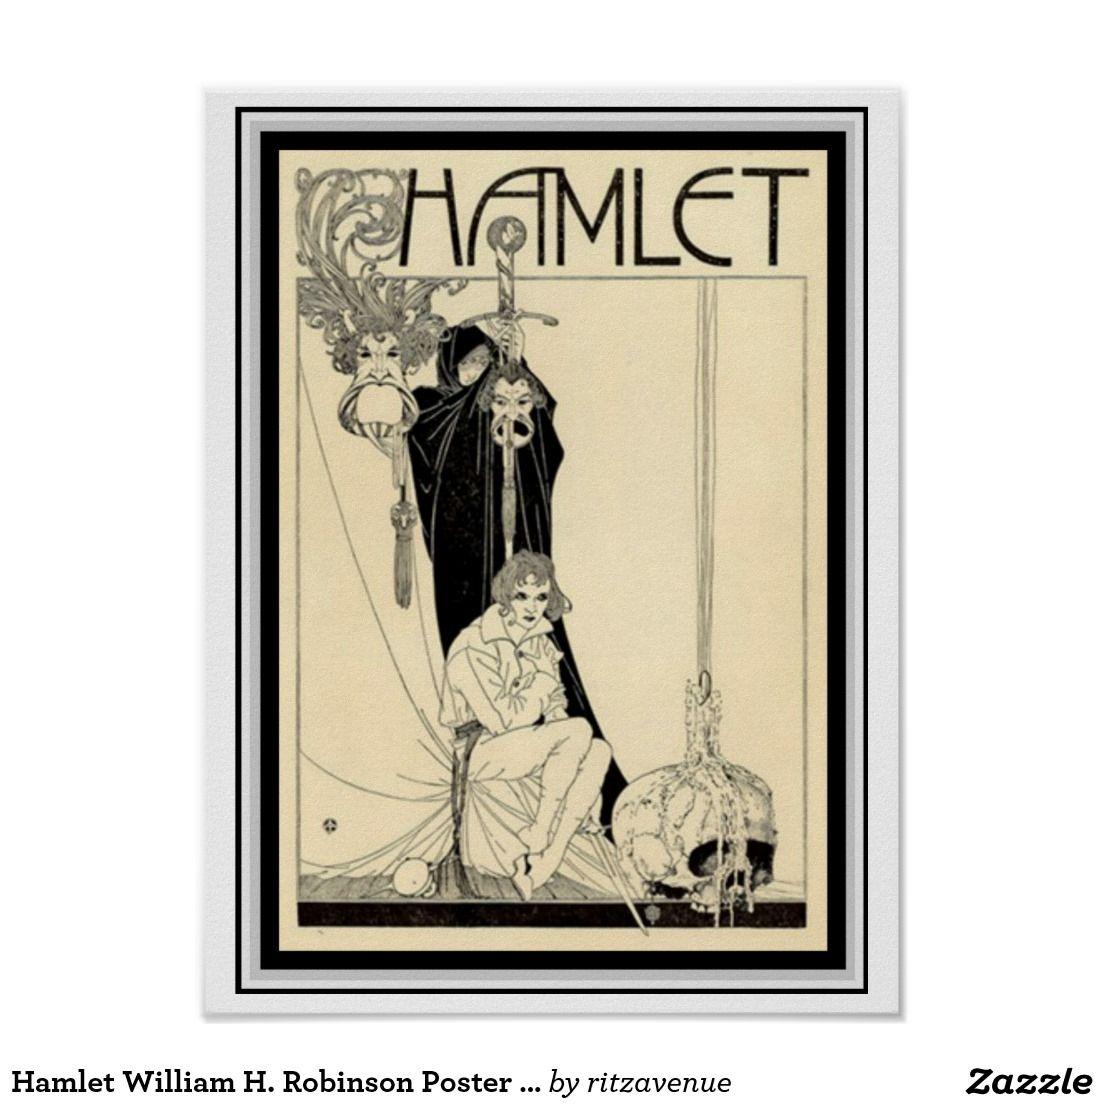 Hamlet William H. Robinson Poster 12 x 16 | Zazzle.com ...